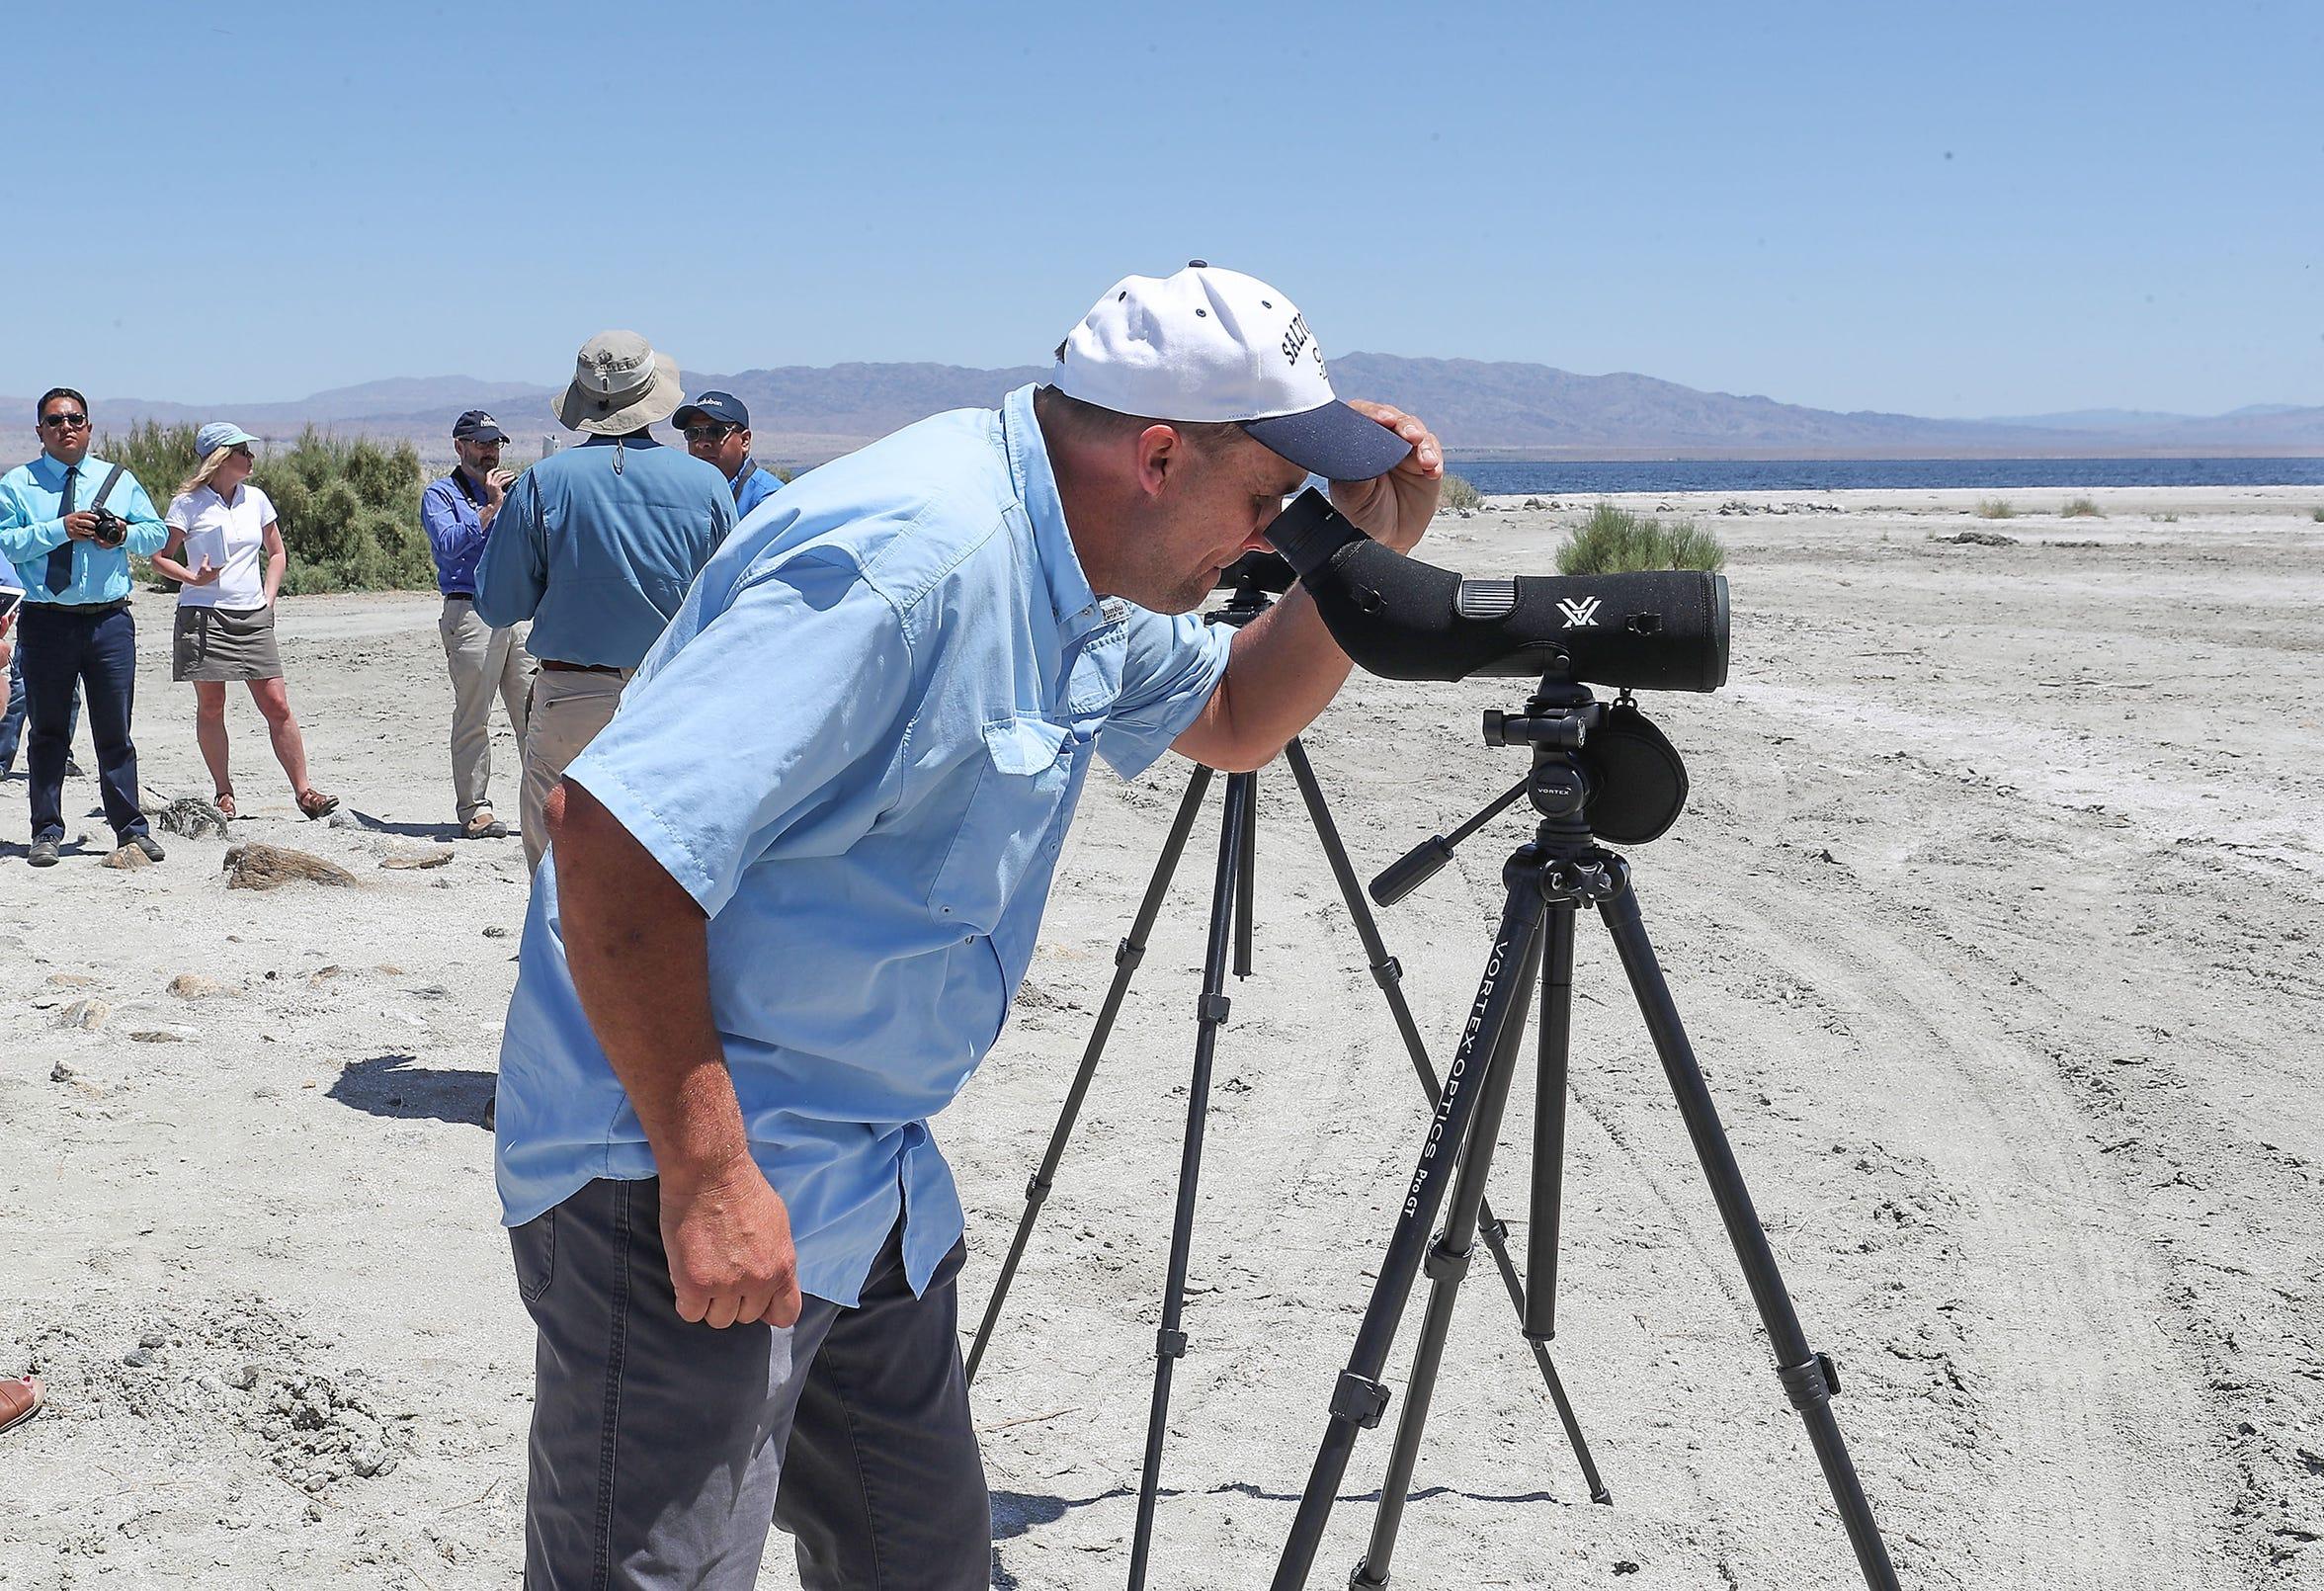 Kurt Leushner, professor of Natural Resources at College of the Desert, looks at birds through at the Salton Sea, April 30, 2019.